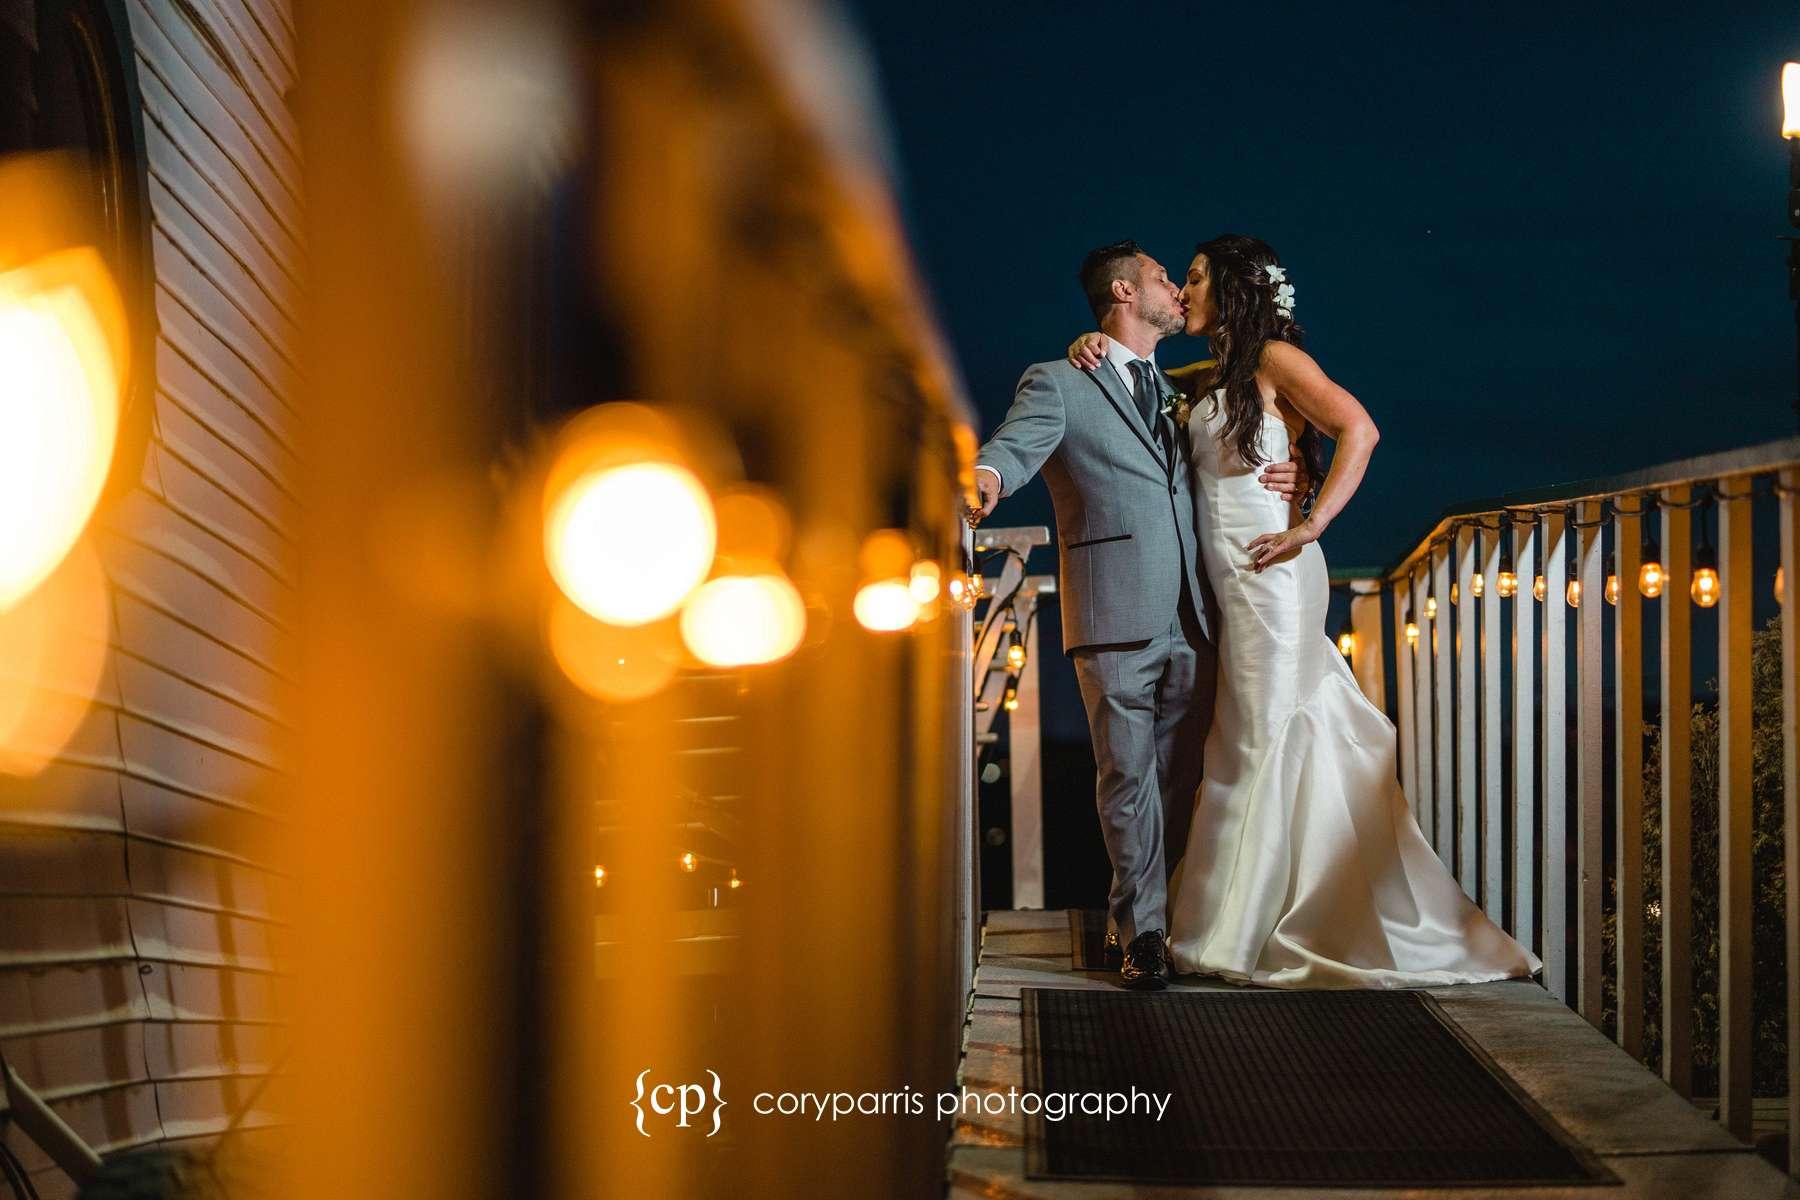 Adriana & Maurizio married on MV Skansonia ferry on Lake Union in Seattle!